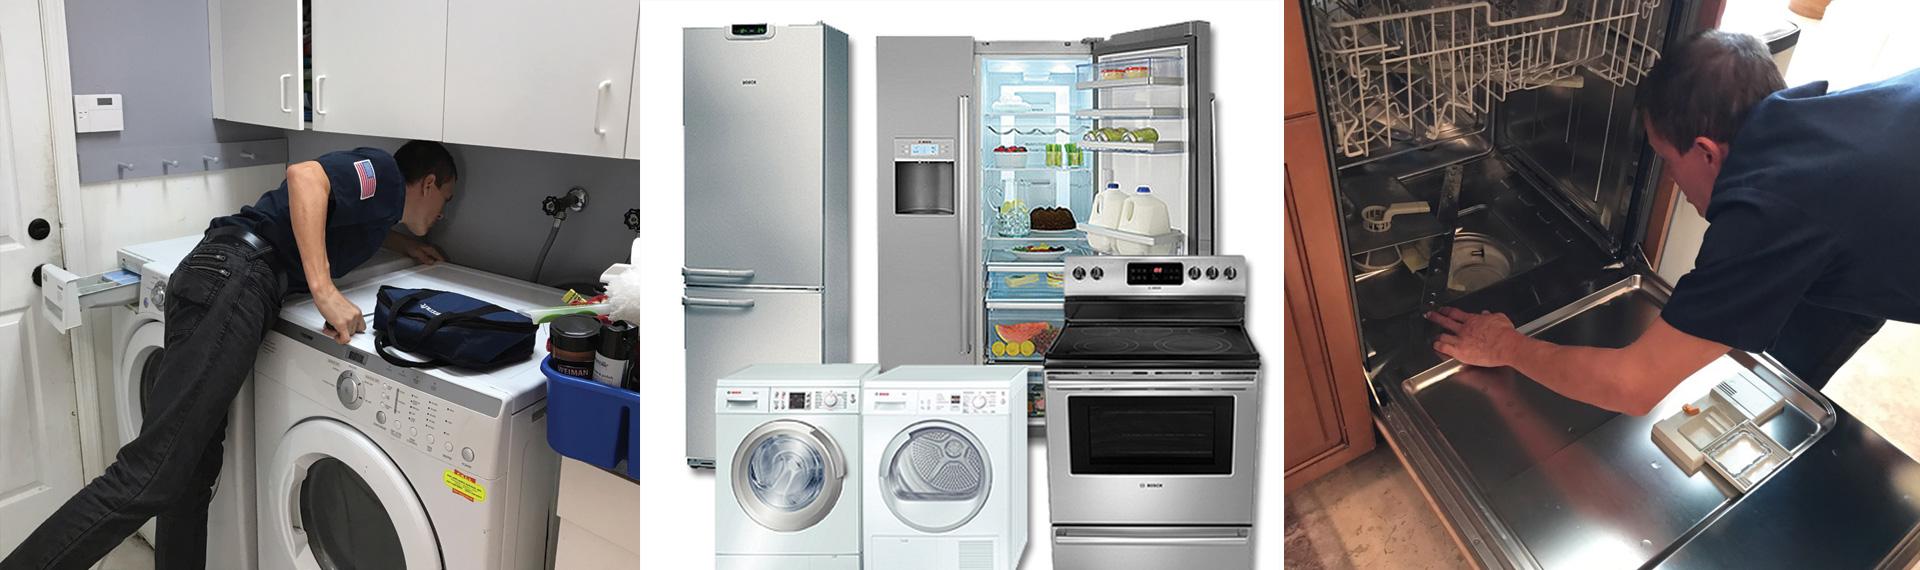 1A Appliance Service Fort Lauderdale FL